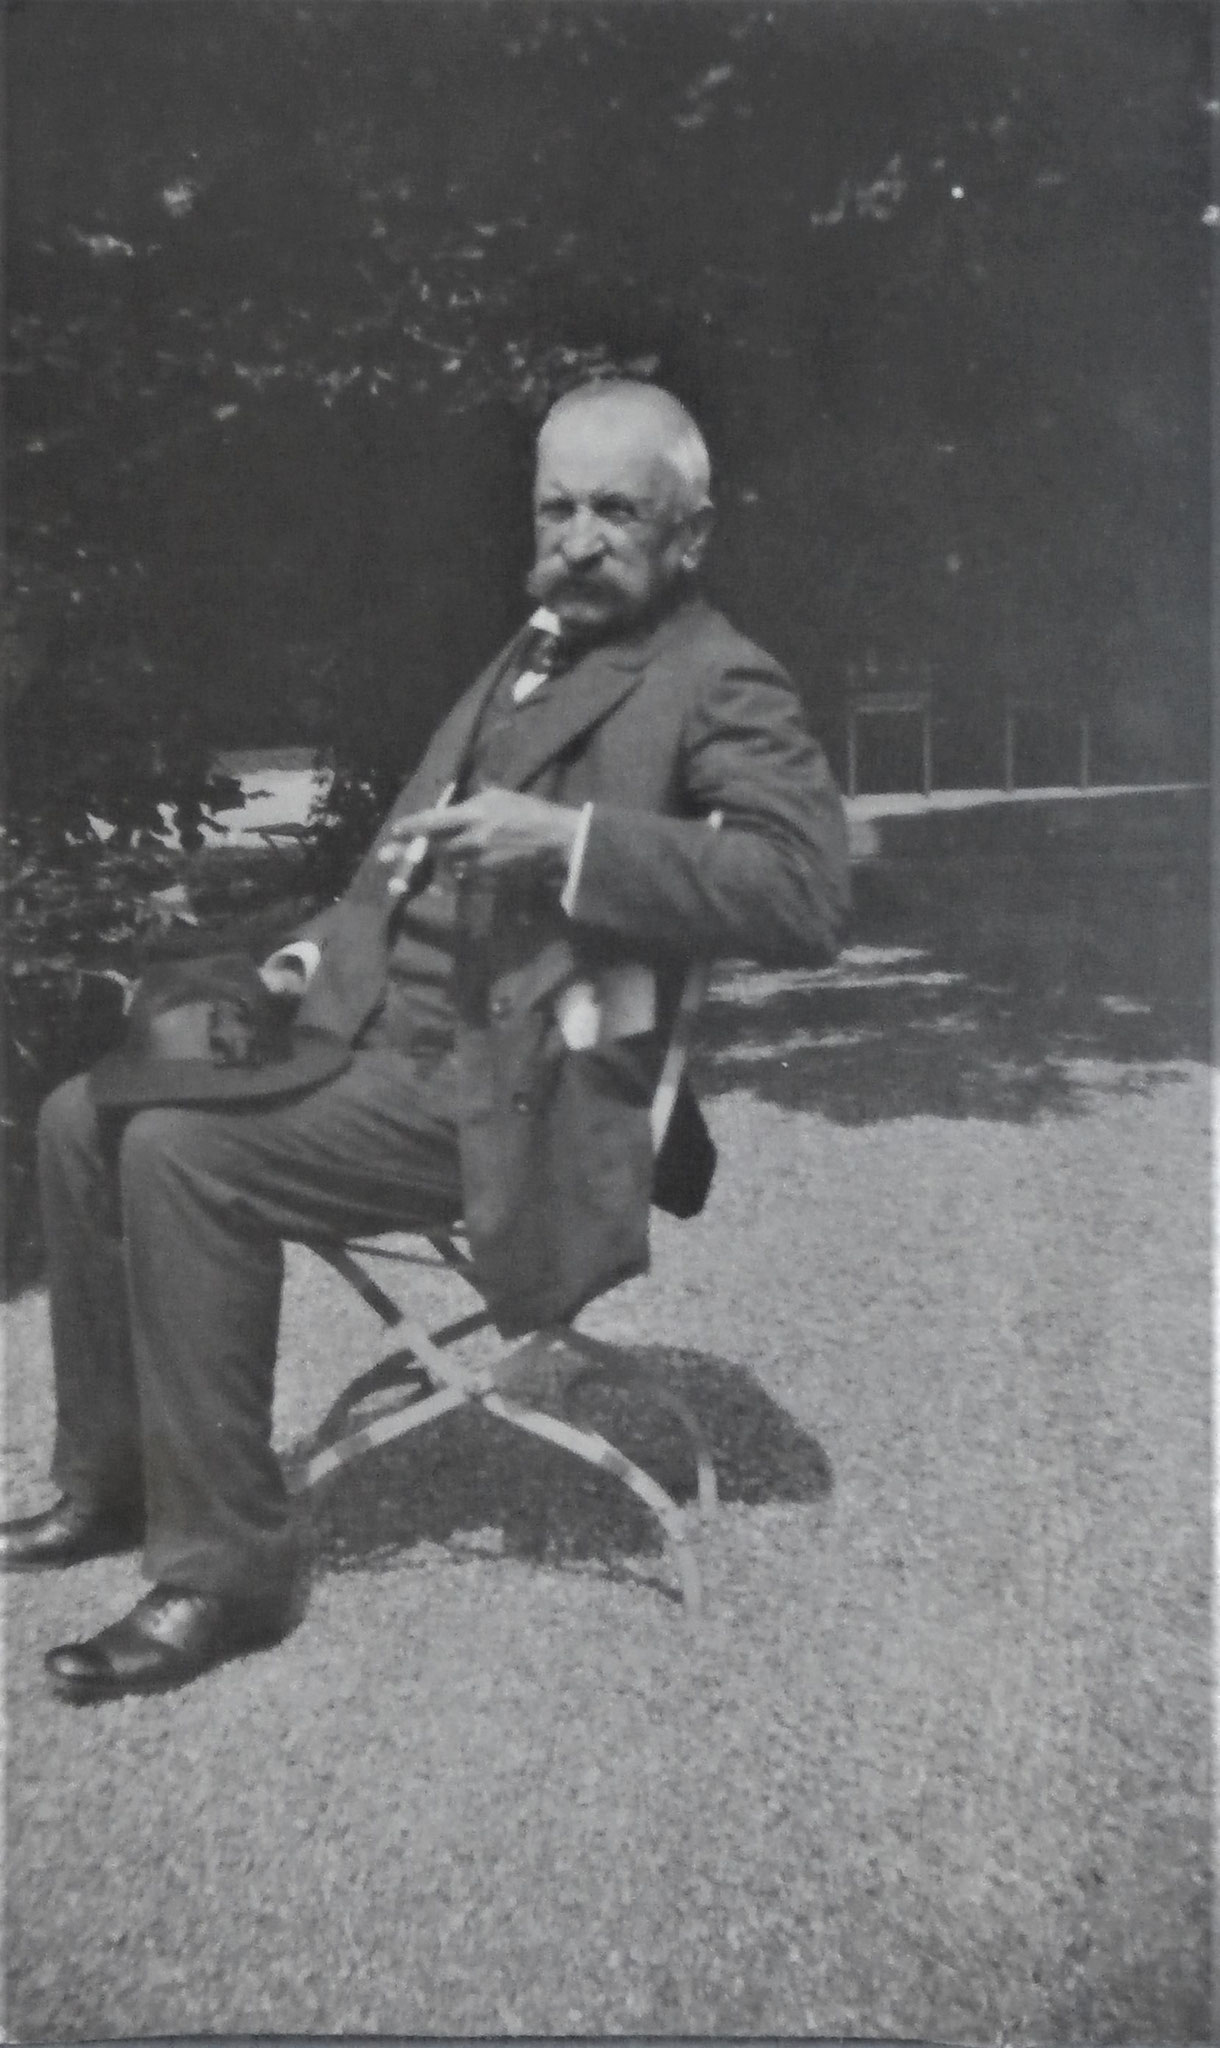 Juli 1906, 1 Monat vor seinem Tode.